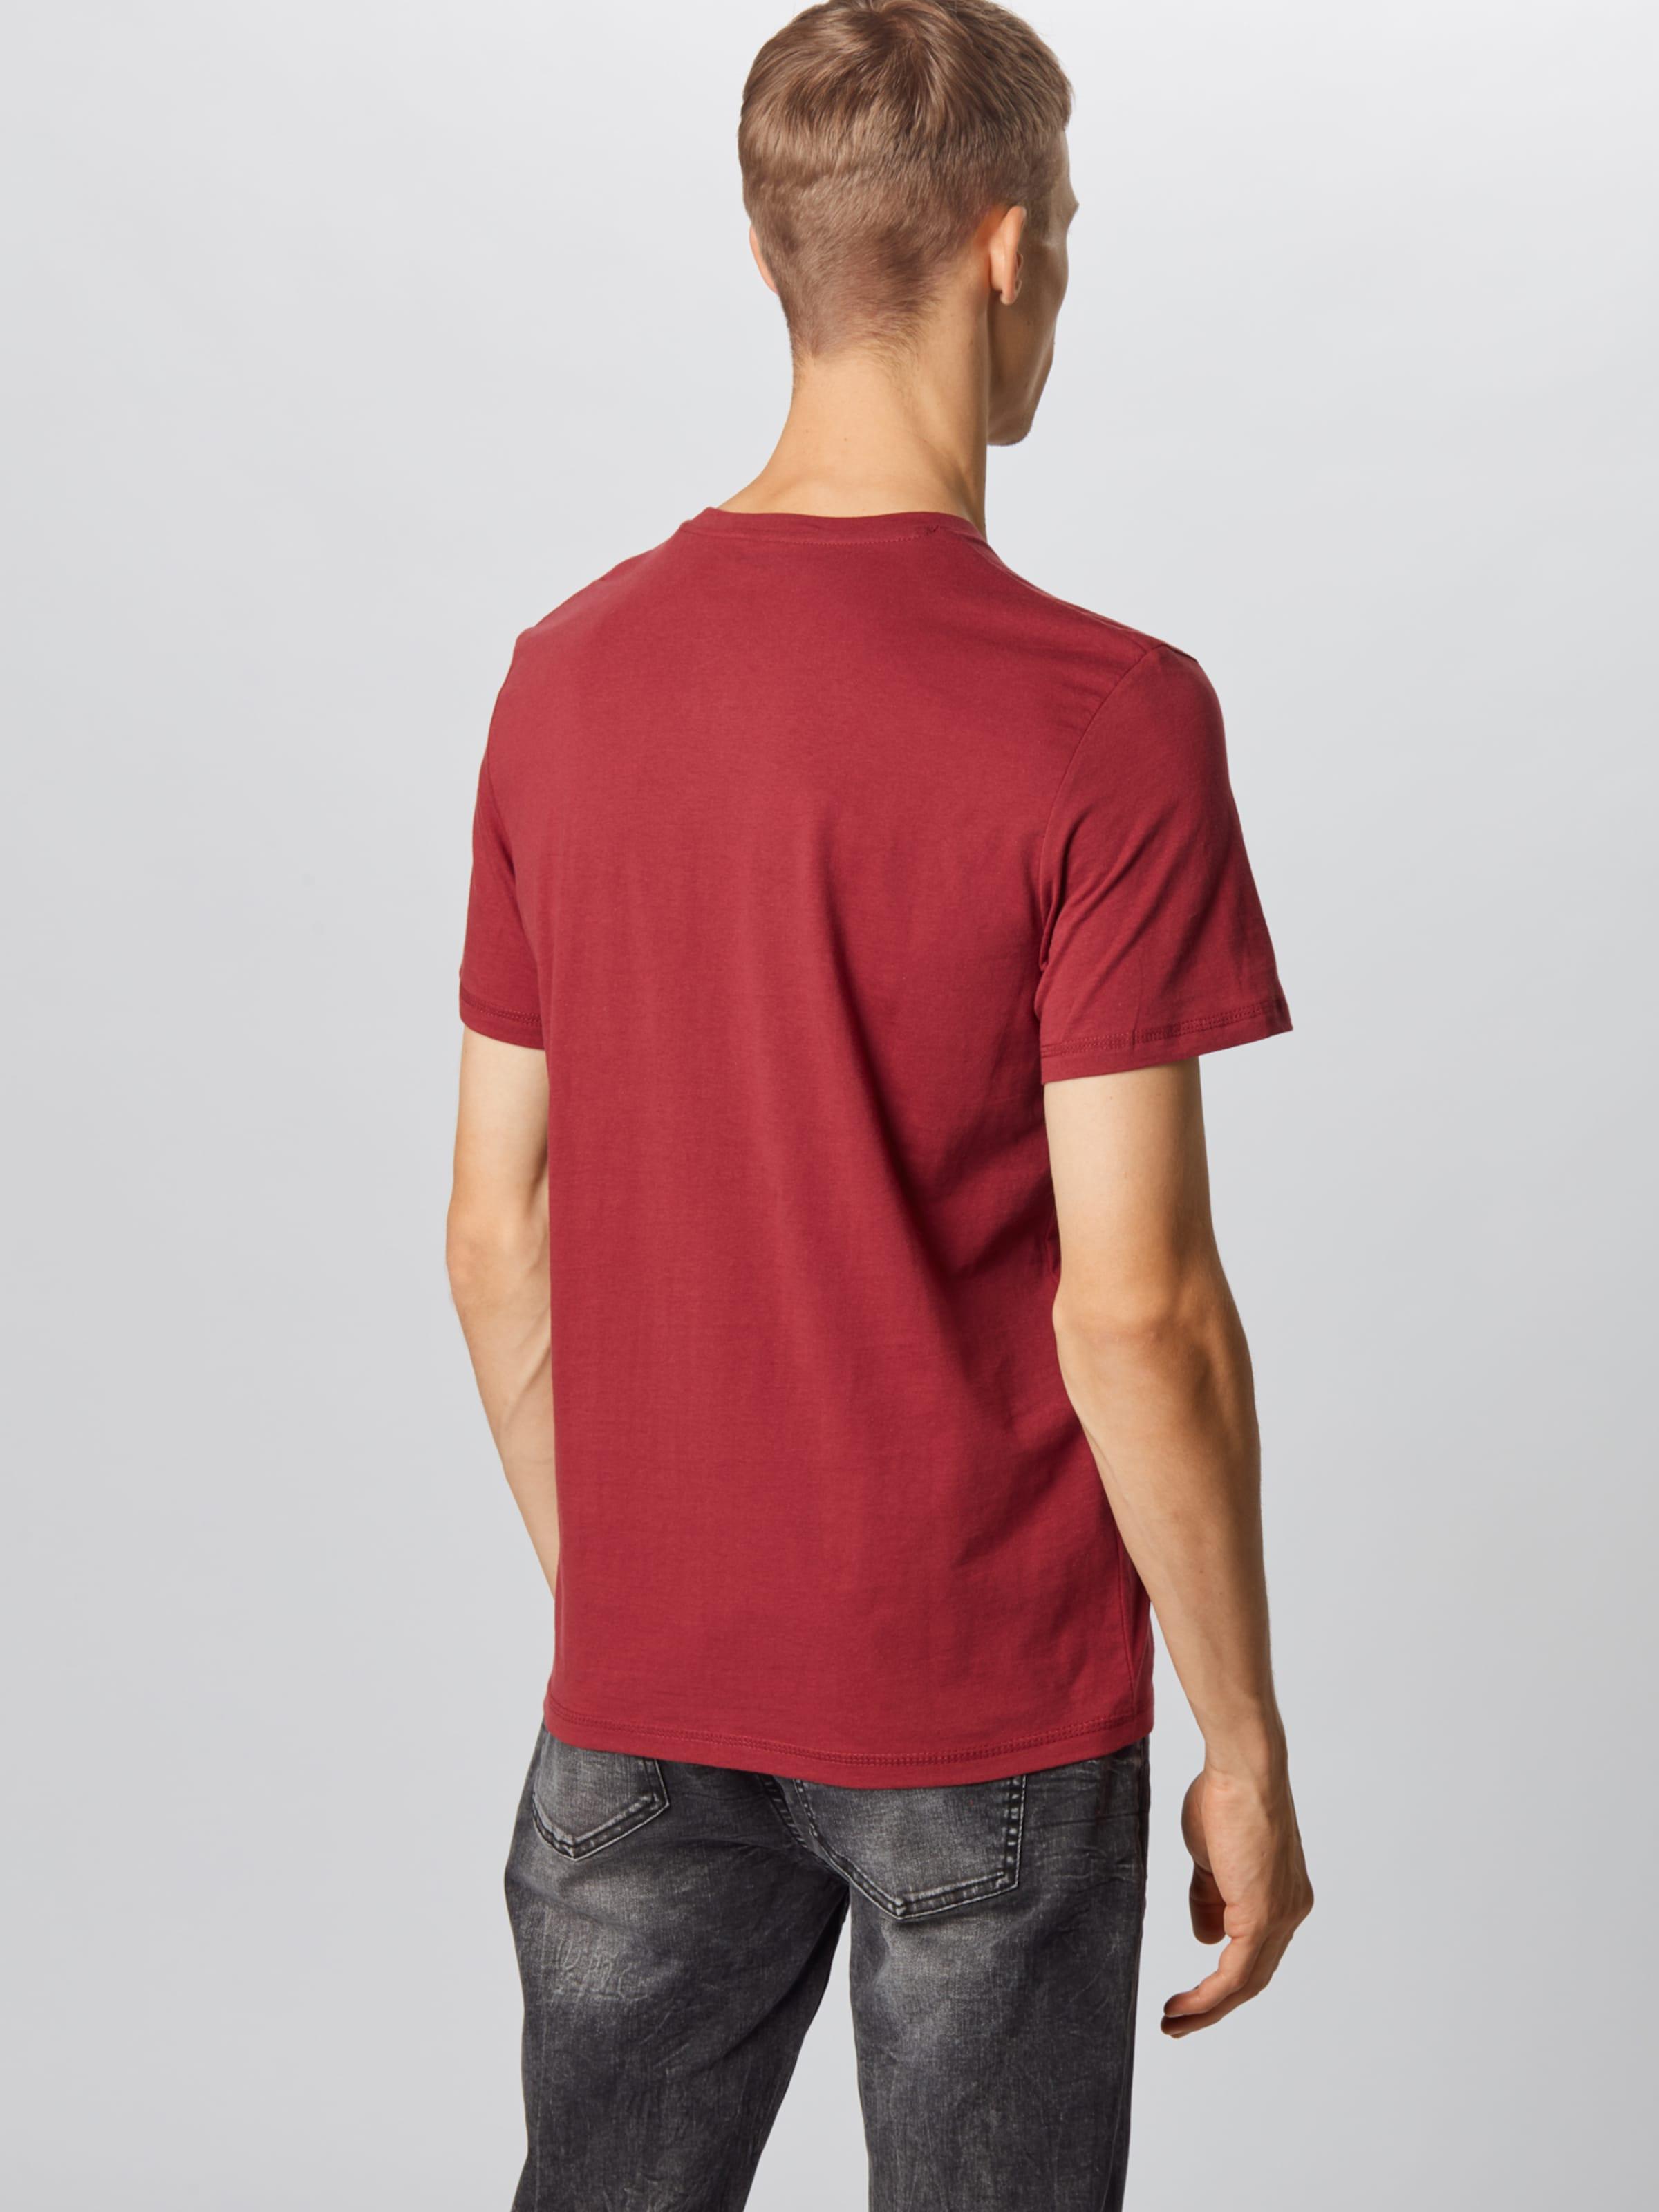 shirt Tailor Tom T En Rouge thsCrdBQx